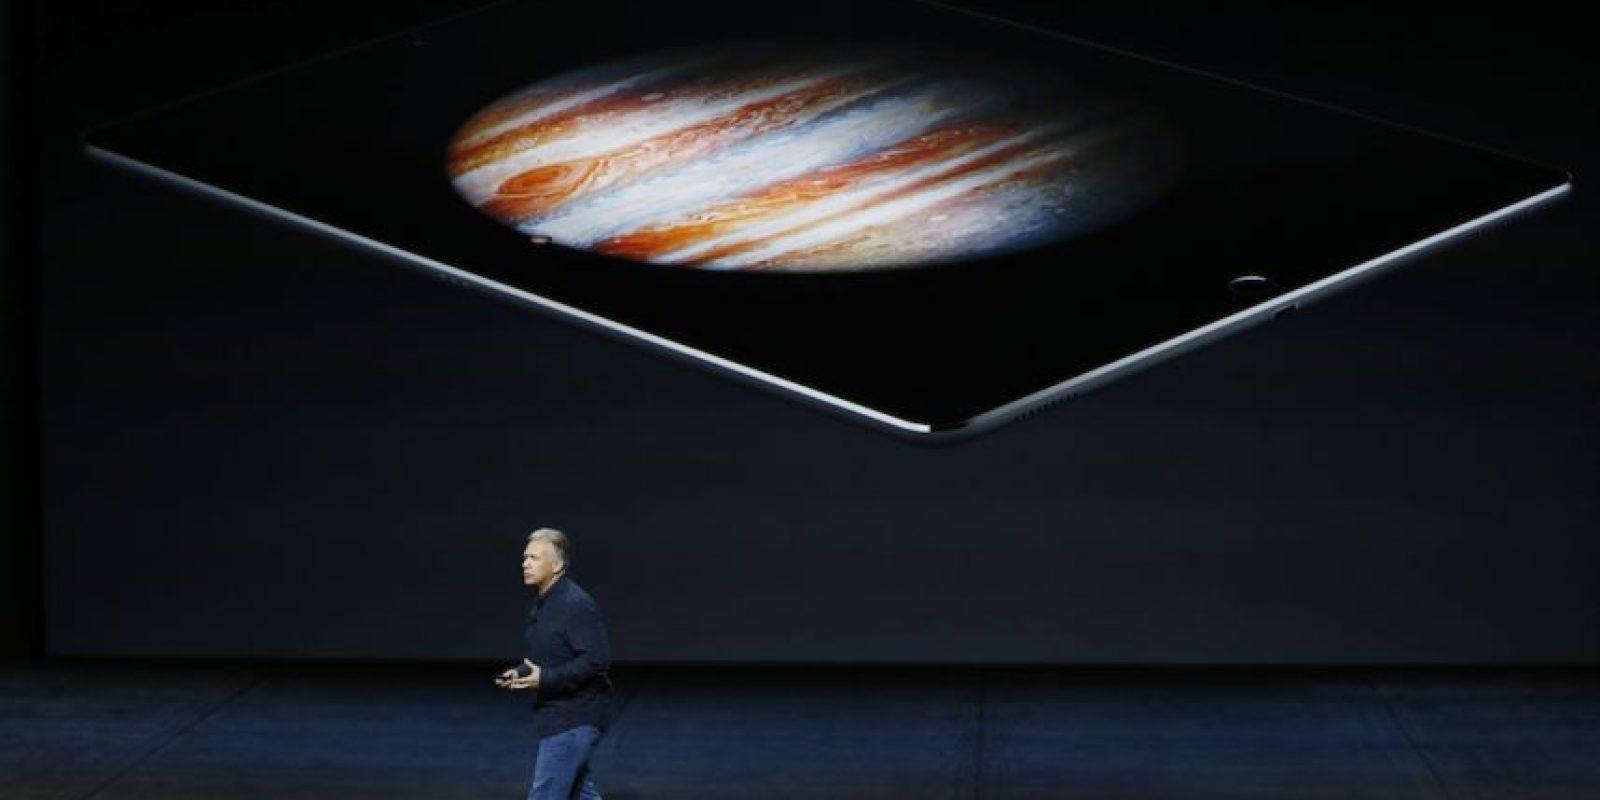 Peso modelo Wi-Fi: 713 gramos (1.57 libras). Foto:Getty Images